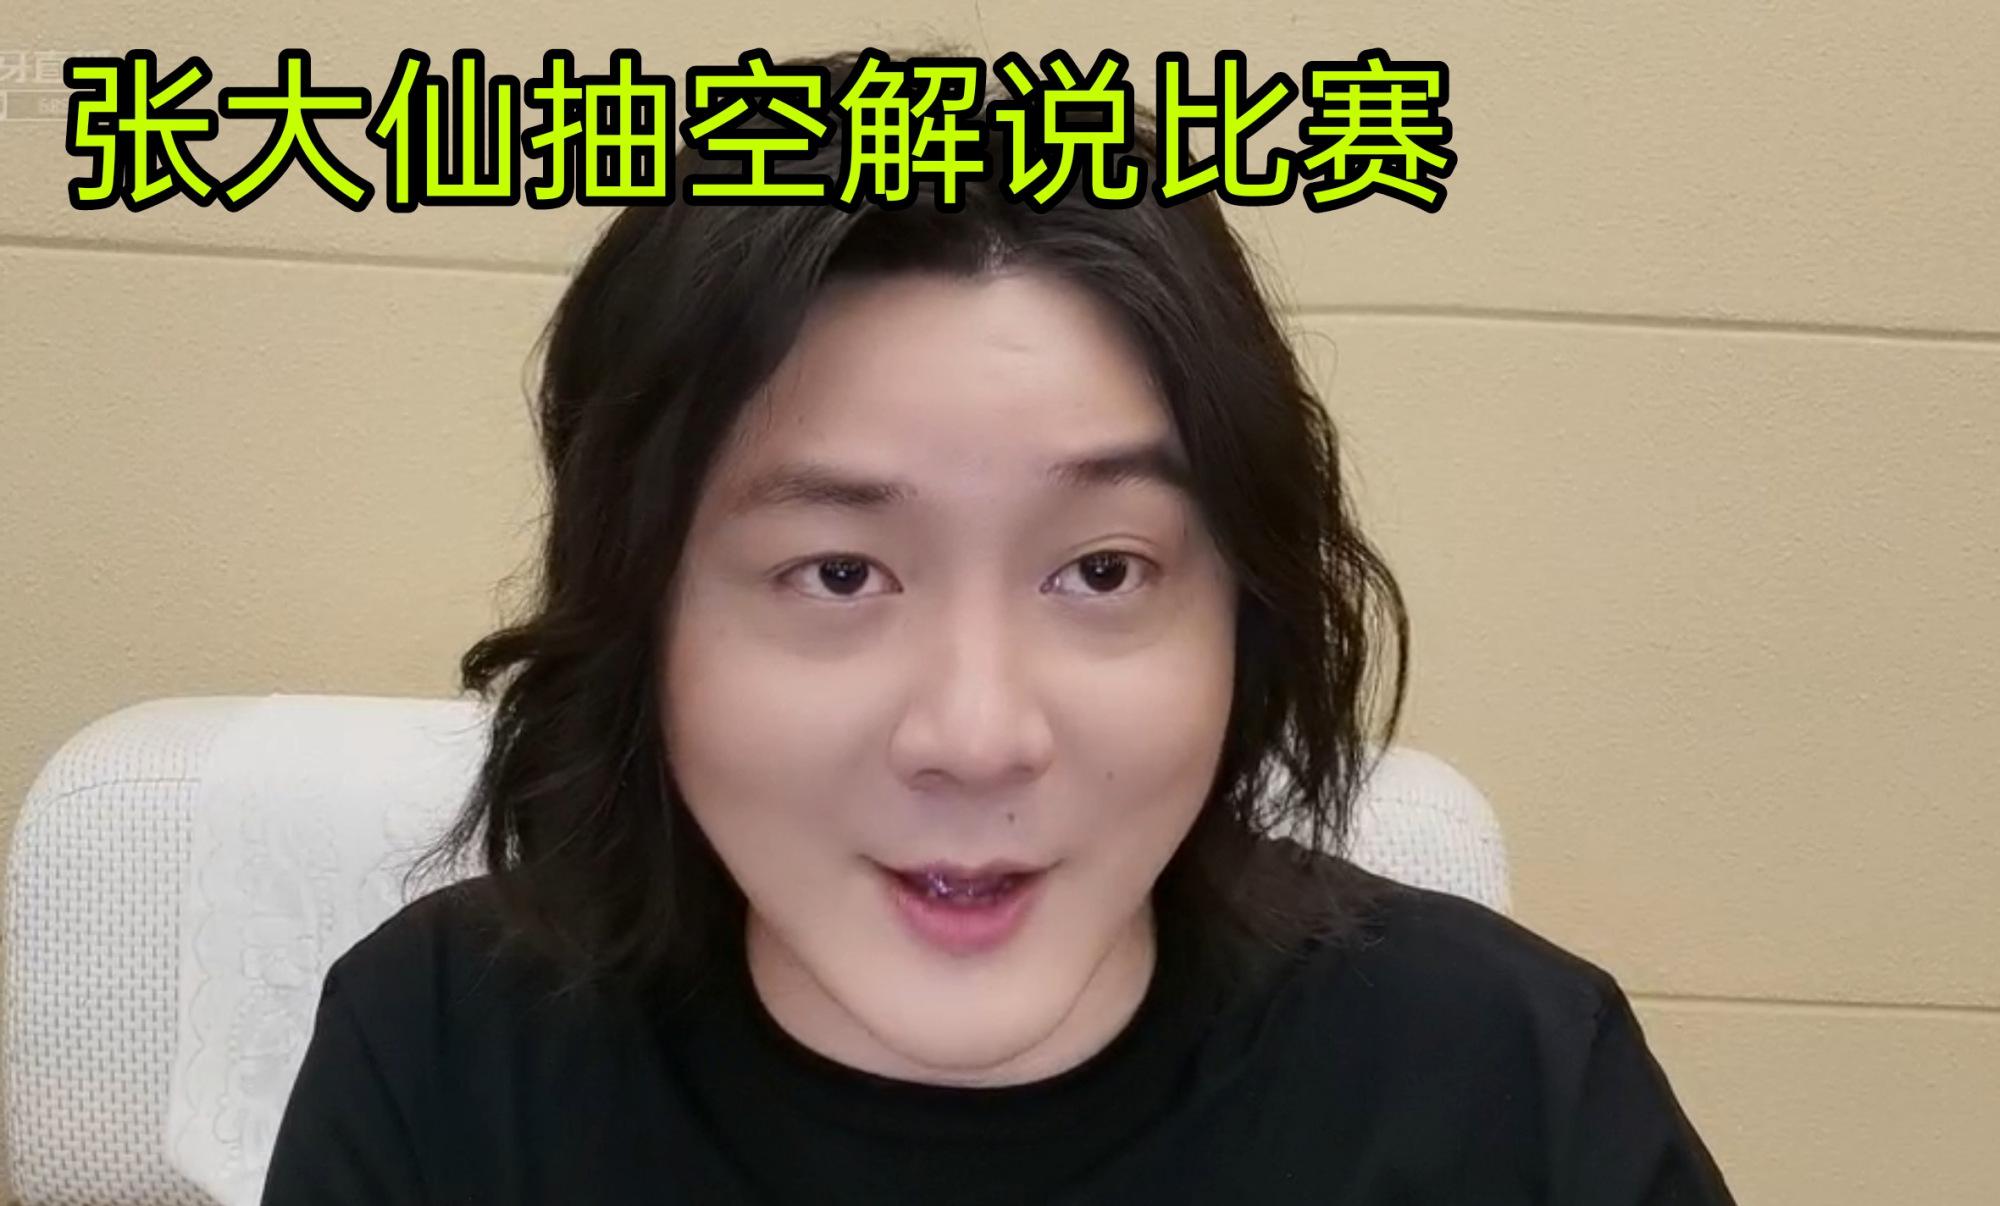 XYG夺冠进KGL,张大仙行程耽误缺席,抽空观赛,激动发文